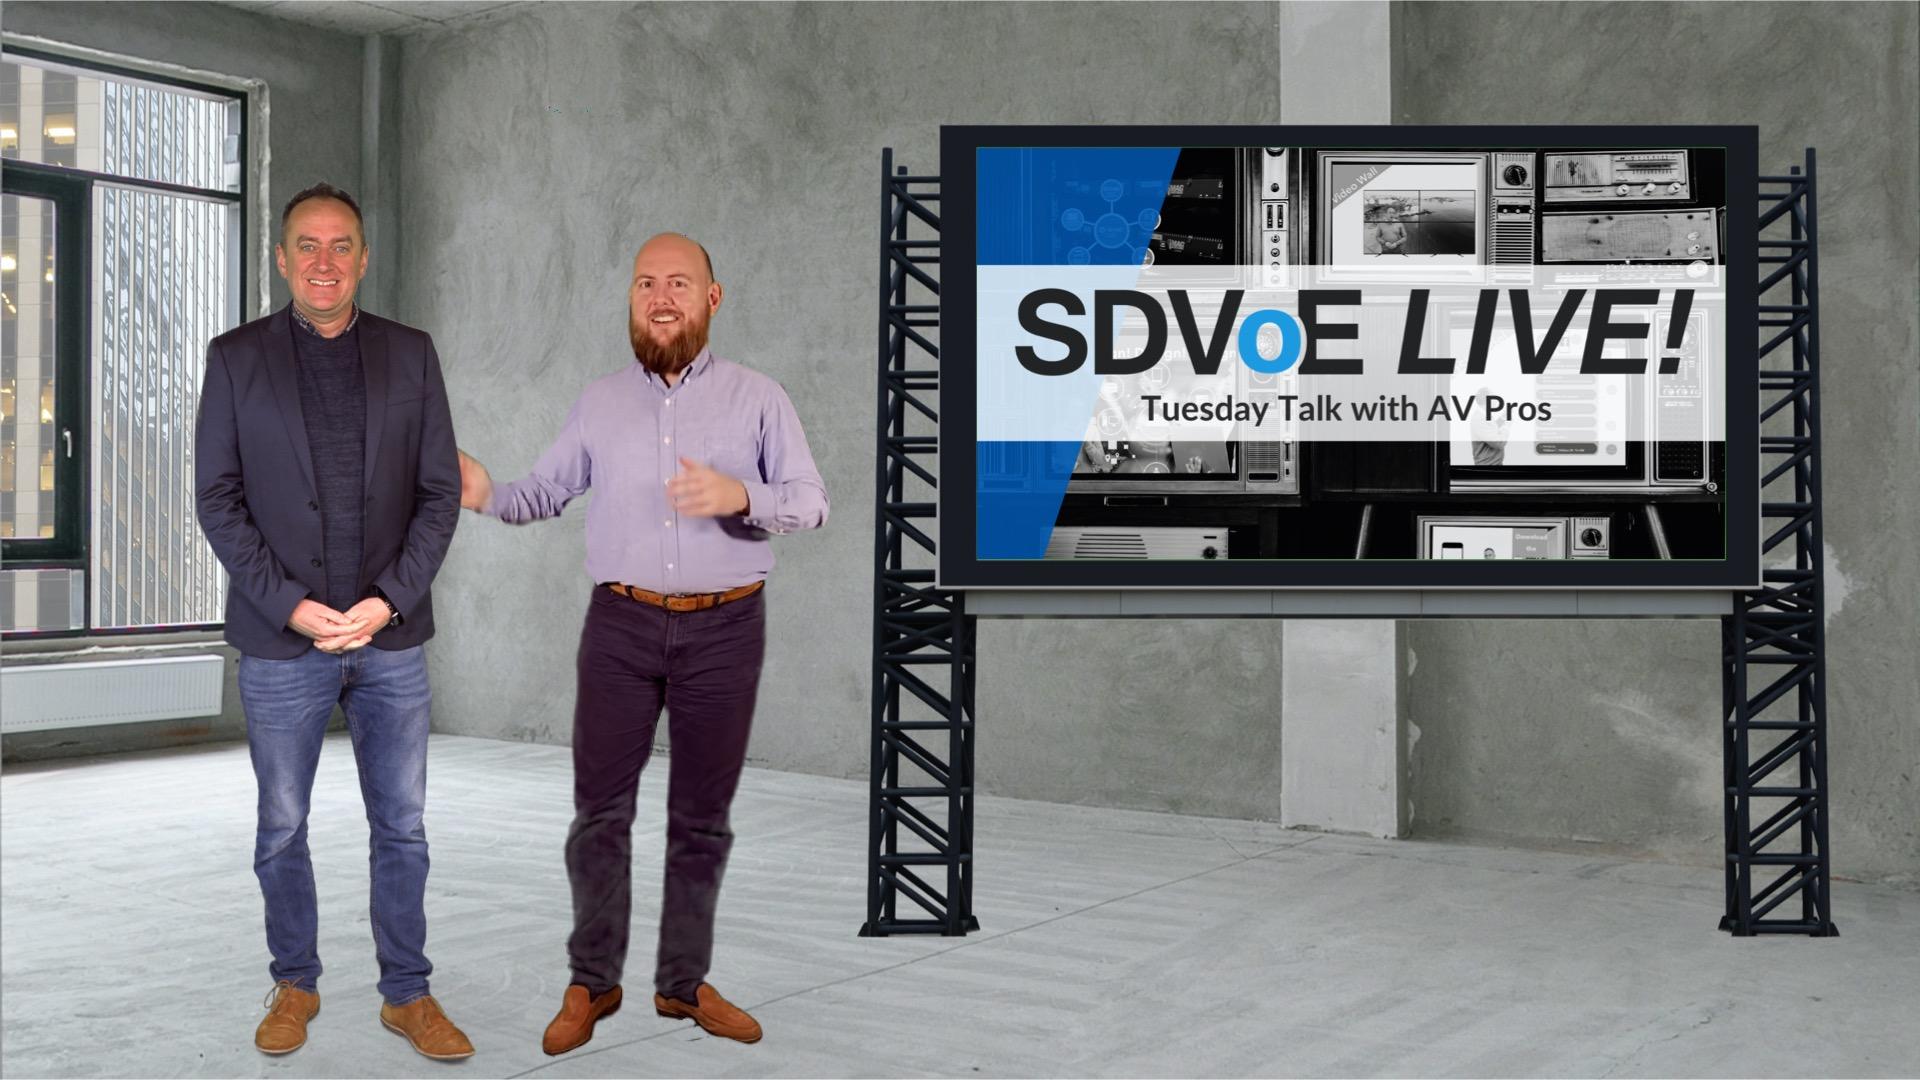 SDVoE LIVE! Episode 6: Why Samsung Chose SDVoE over a Matrix